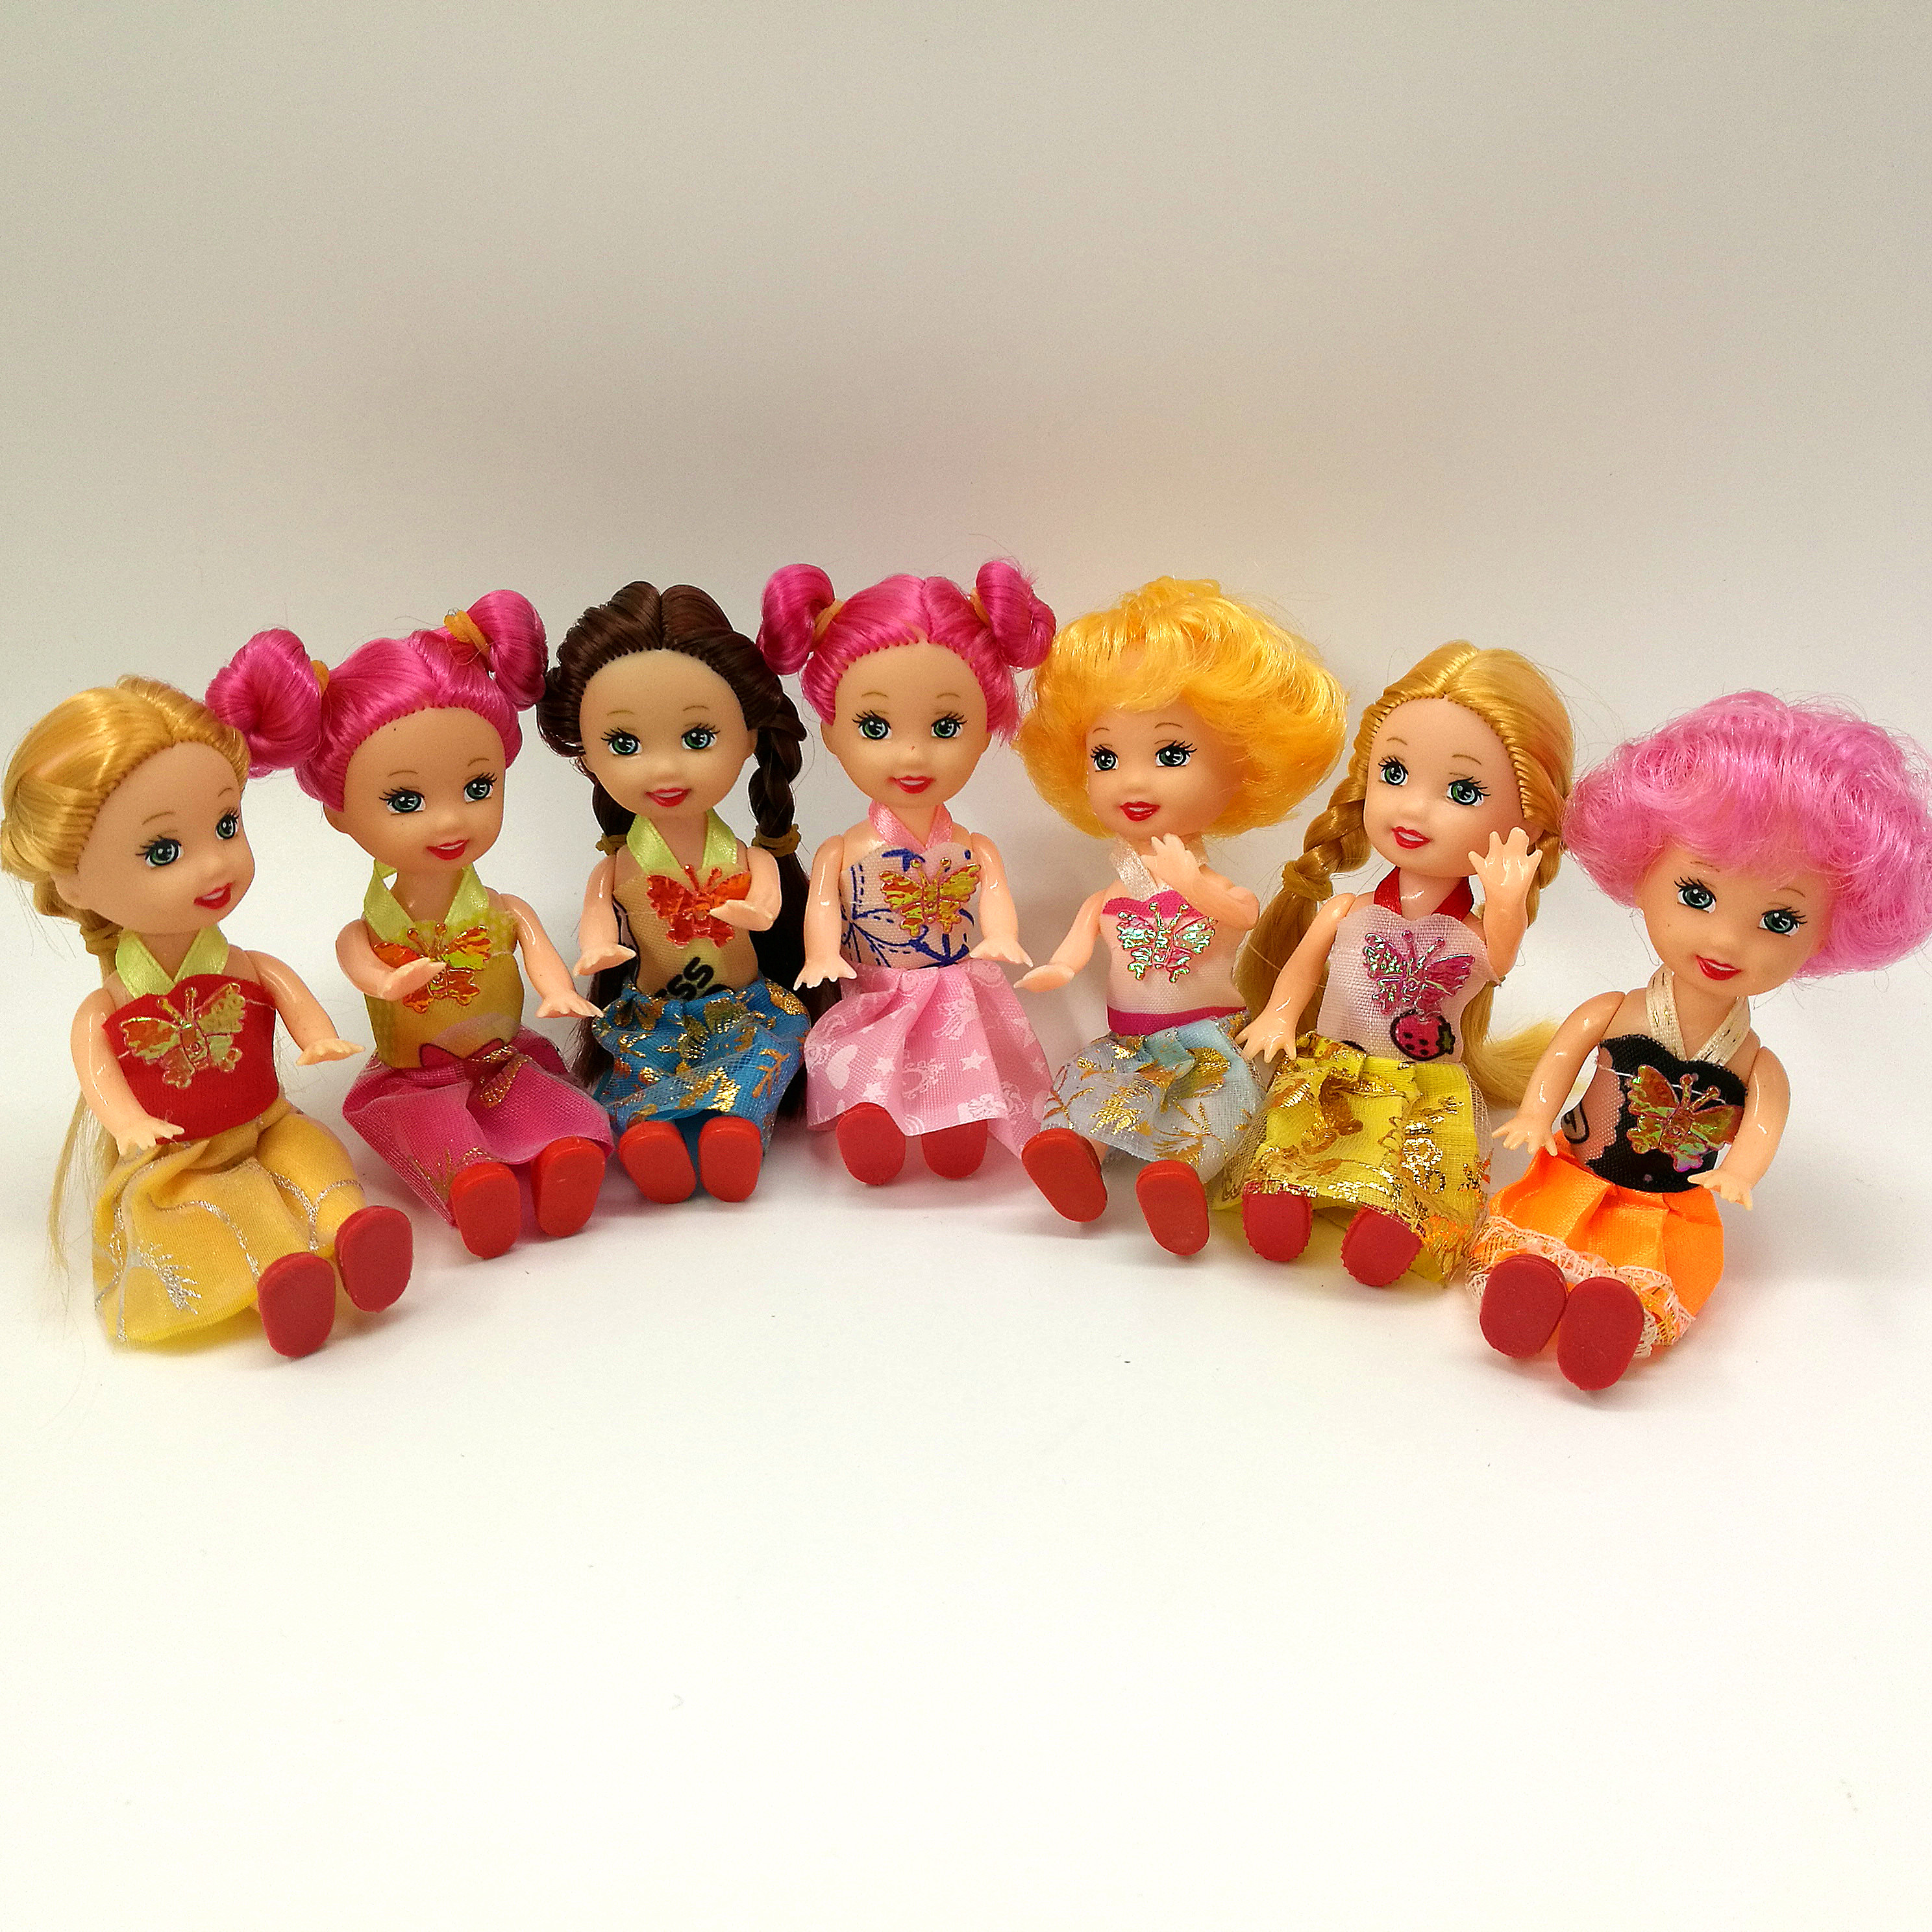 2pcs Fashion Mini Dolls For Girls Curly White Pink Brown Hair